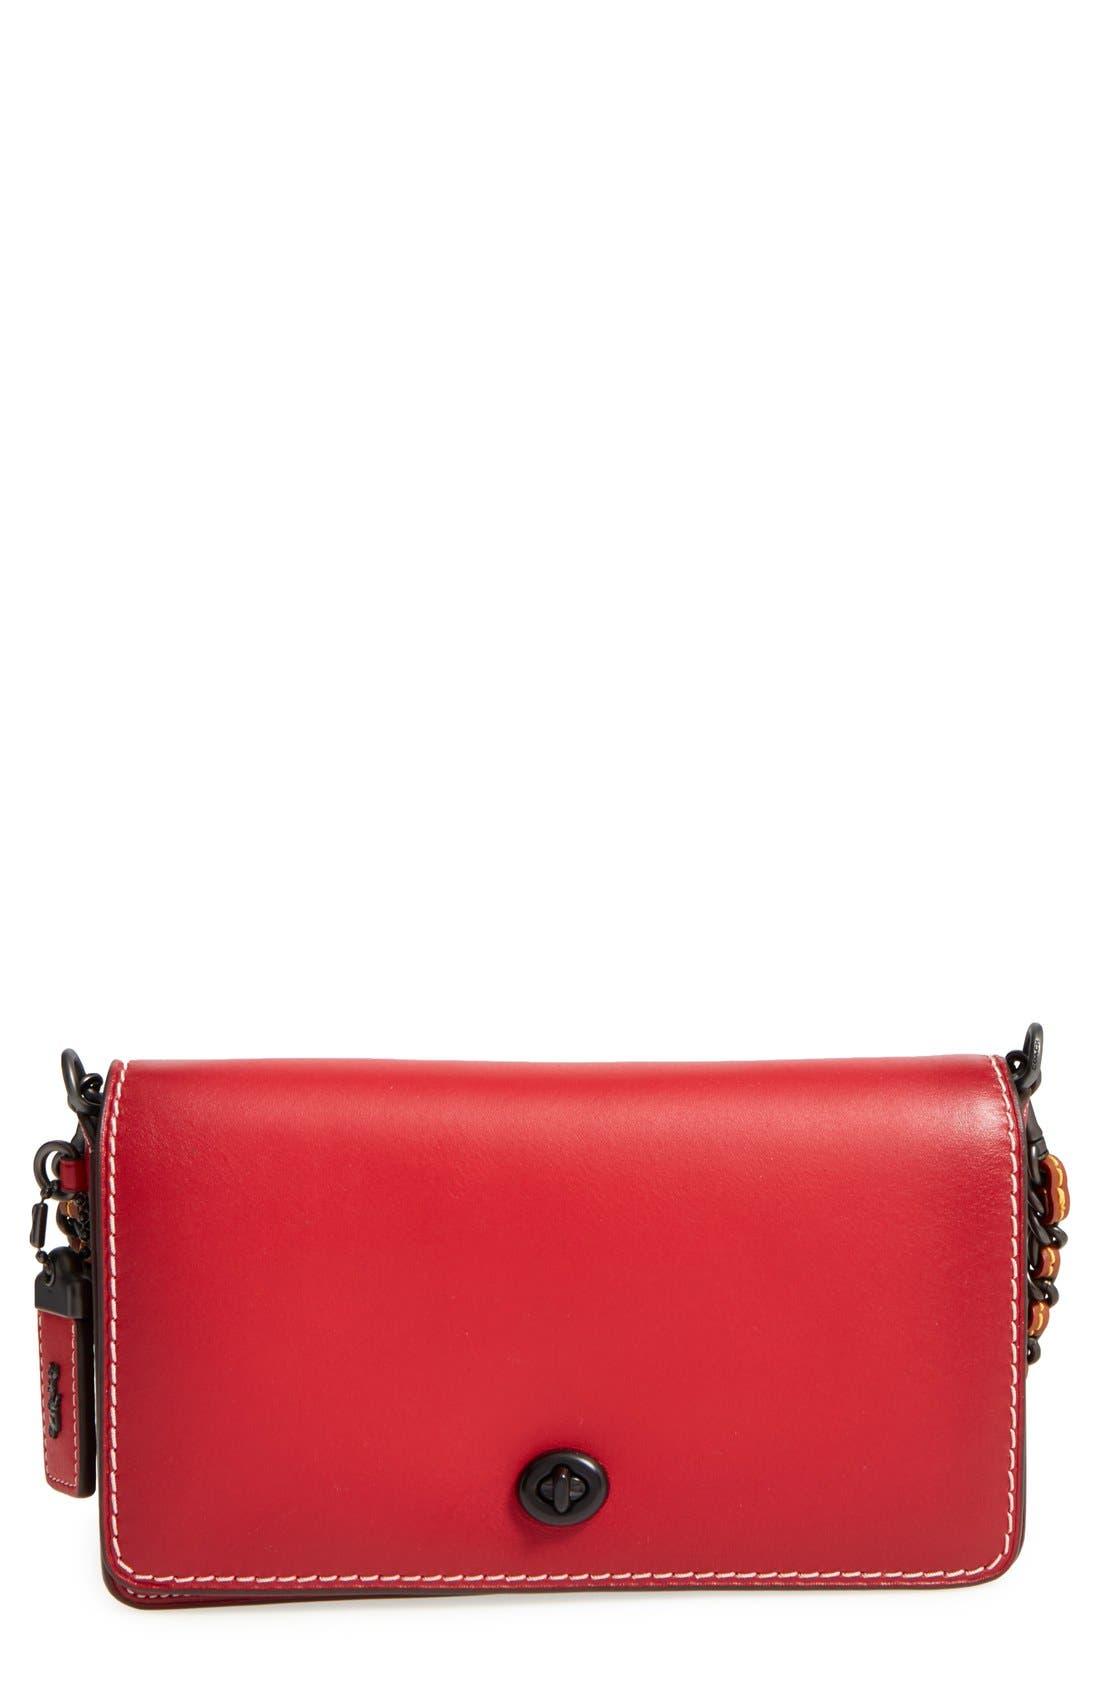 COACH 1941 Dinky Leather Crossbody Bag